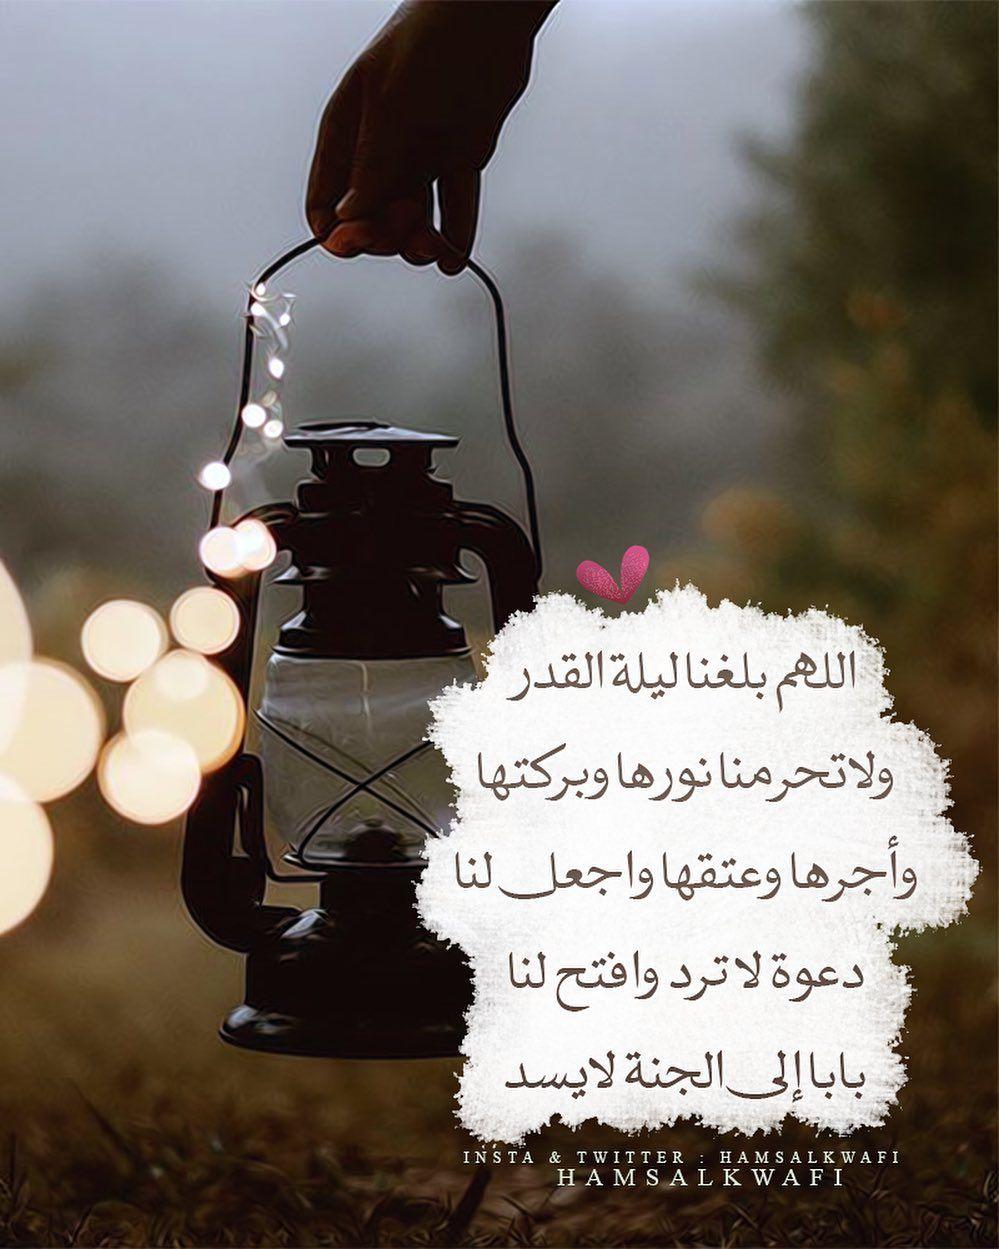 Instagram Post By كہ ن ذا أثہ ـر May 25 2019 At 4 45pm Utc Ramadan Images Ramadan Mubarak Wallpapers Ramadan Greetings